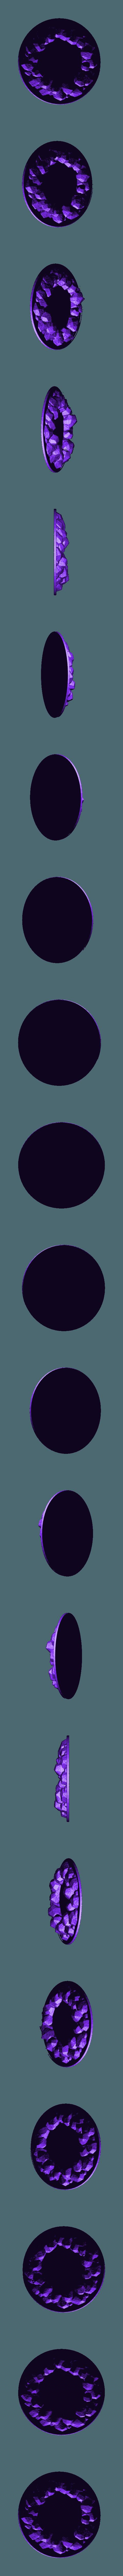 PurpleWorm_Base.stl Download free STL file Purple Worm • 3D print design, daandruff